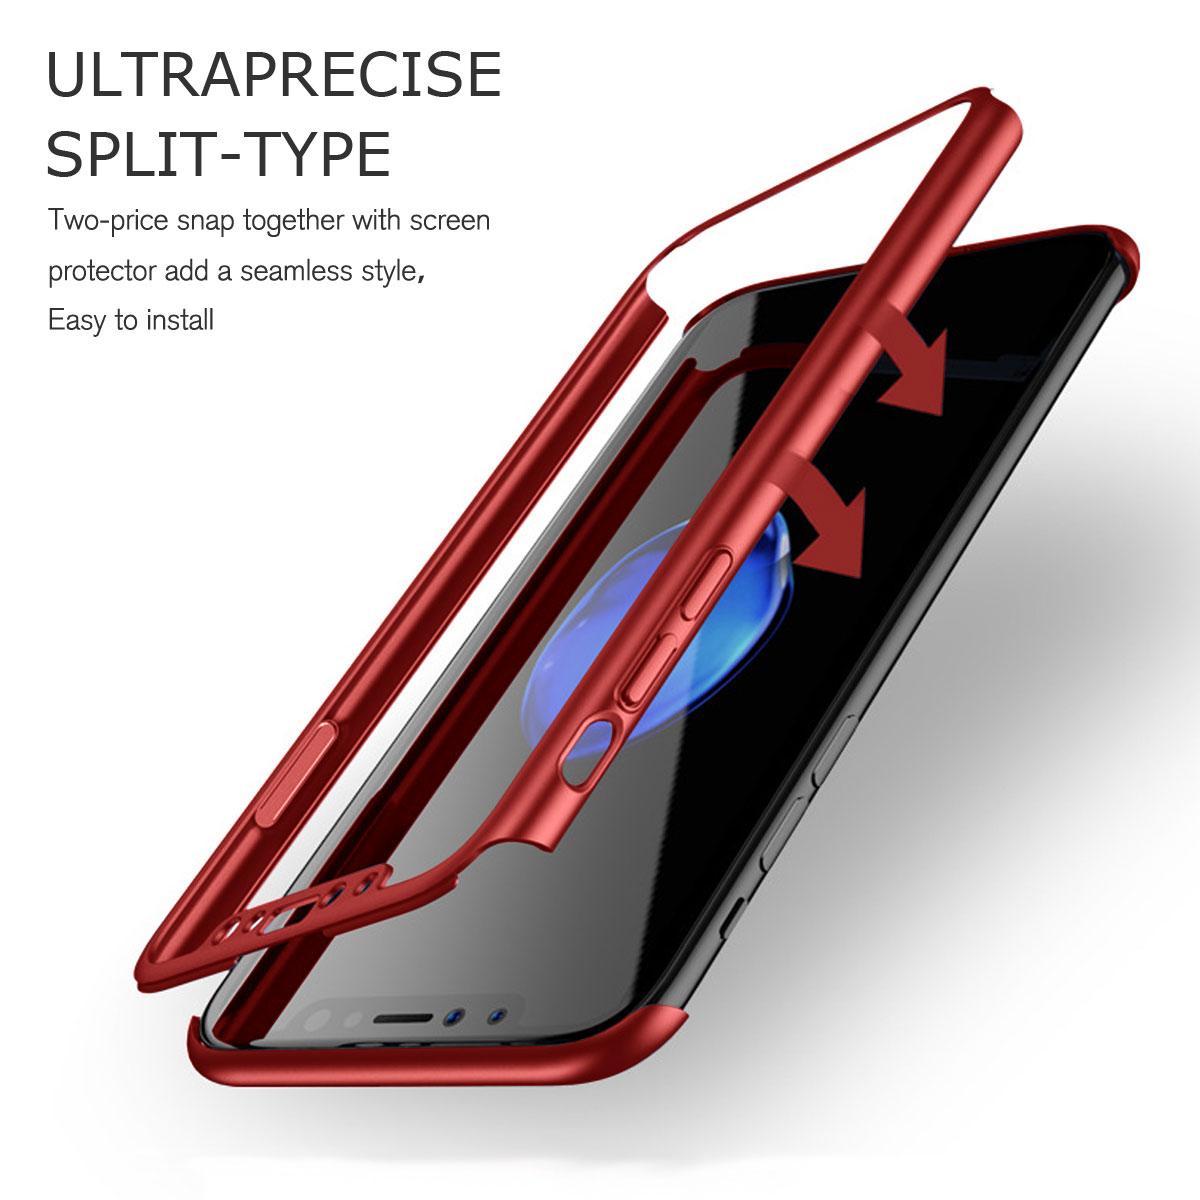 Red jewelry earphones wireless - wireless earphones iphone 8